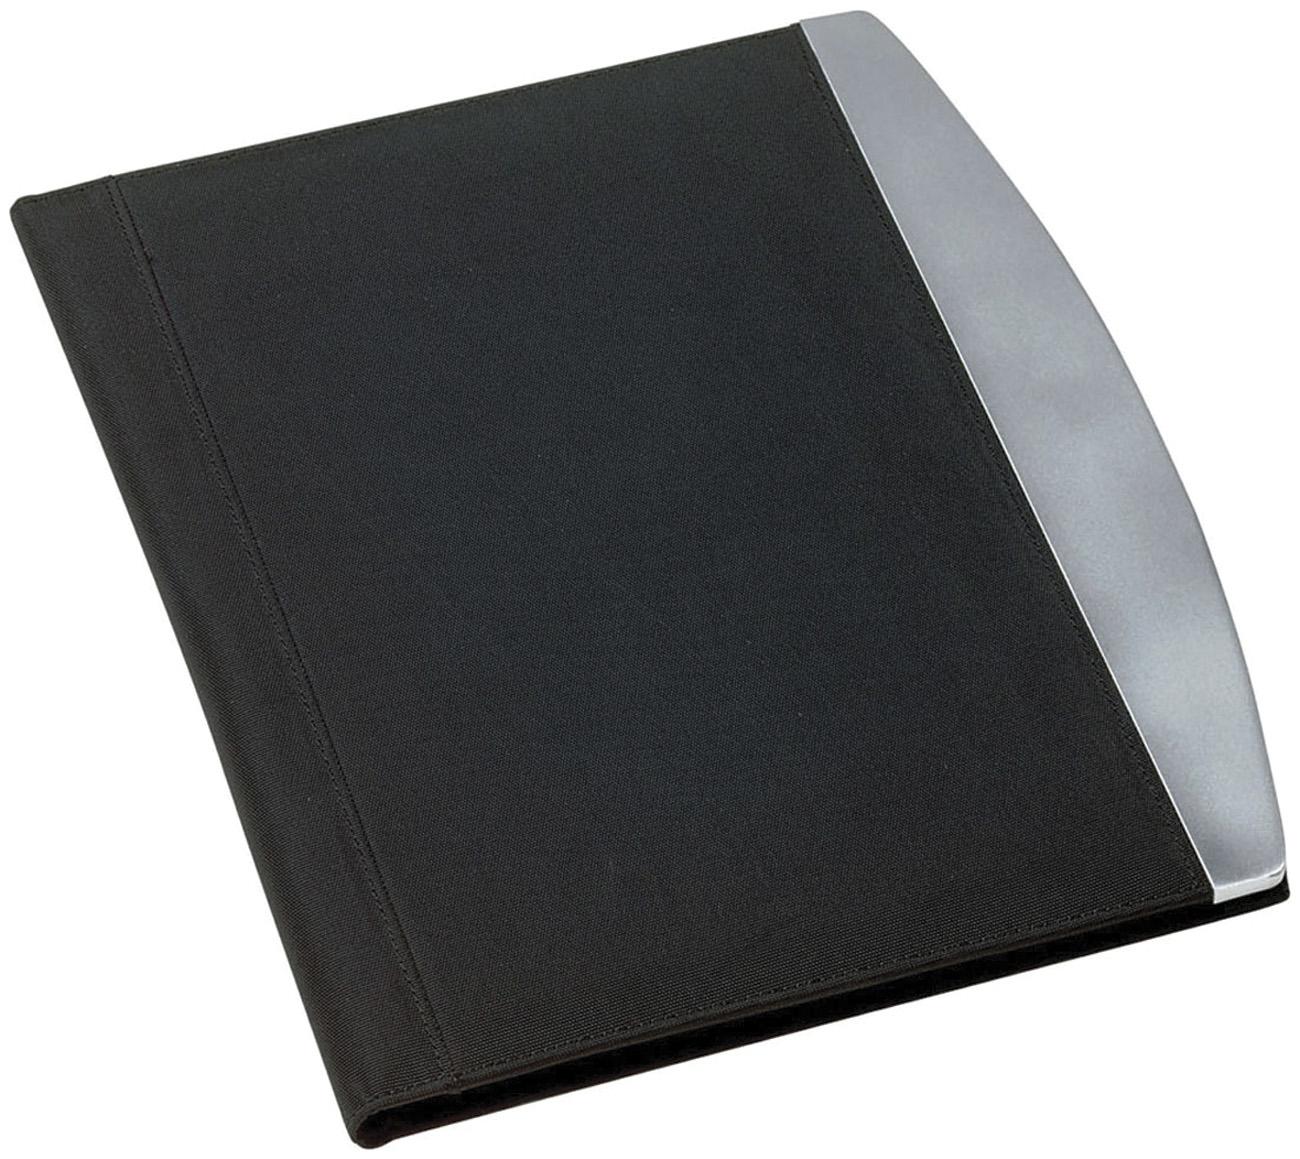 Alu Edge A4 Metal Plate Portfolio